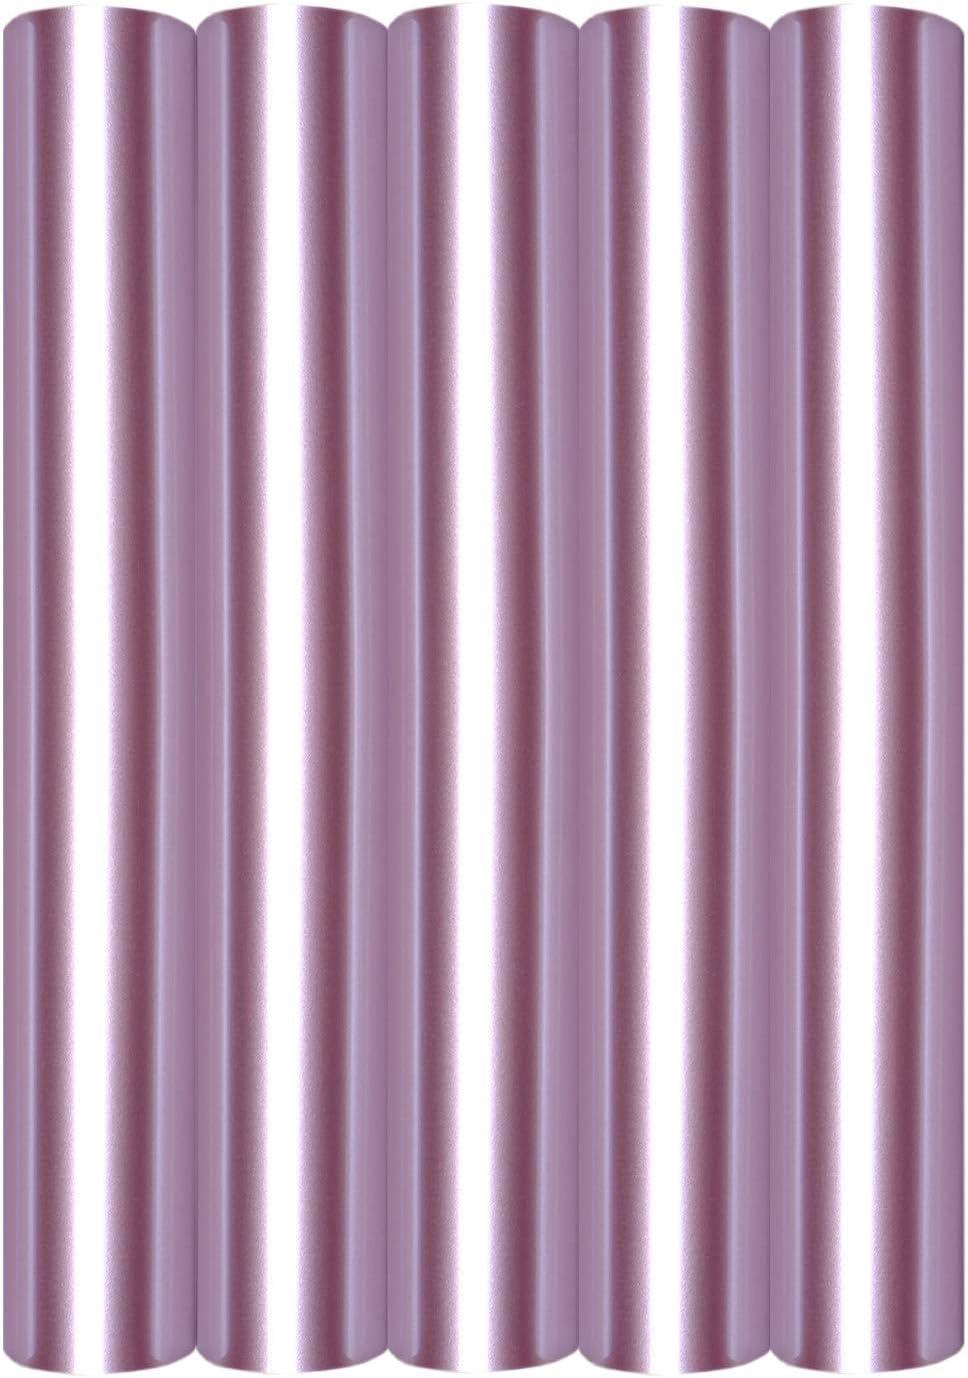 5 láminas de transferencia A4 para planchar sobre textiles, perfectas para plotter, P.S. Film:5er Set Rosé Gold: Amazon.es: Oficina y papelería